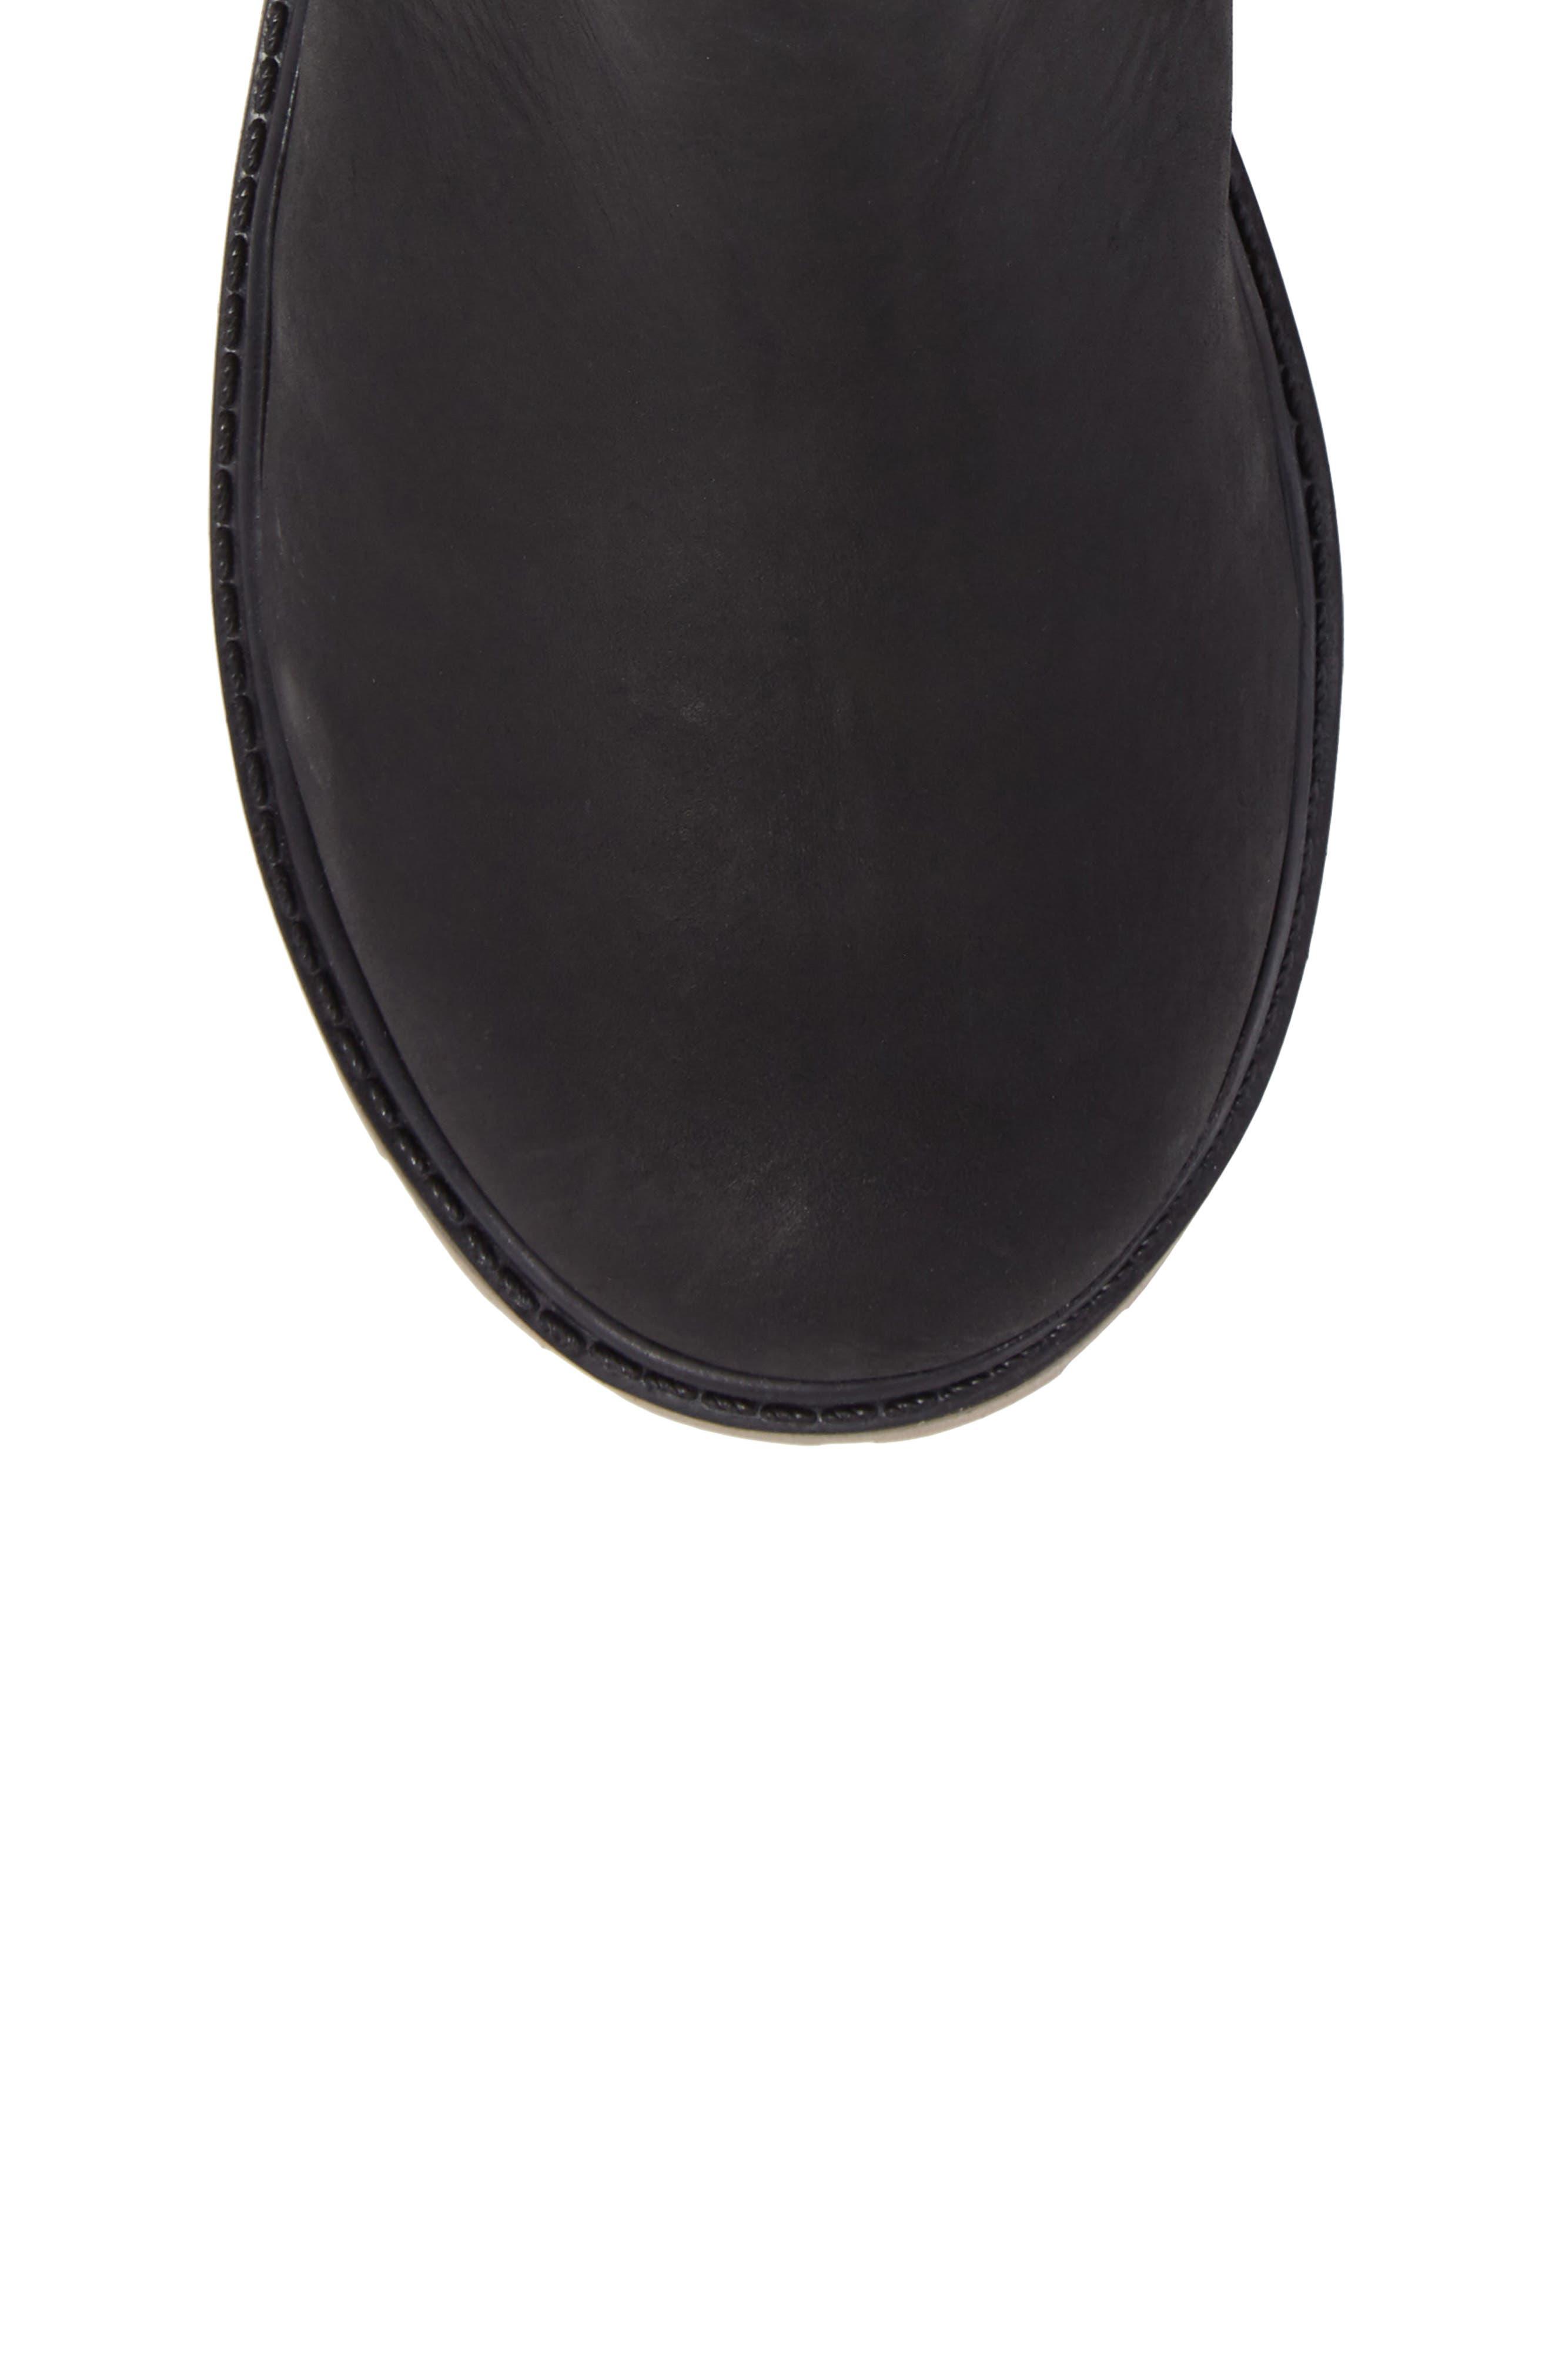 TakodaC Waterproof Chelsea Boot,                             Alternate thumbnail 5, color,                             010